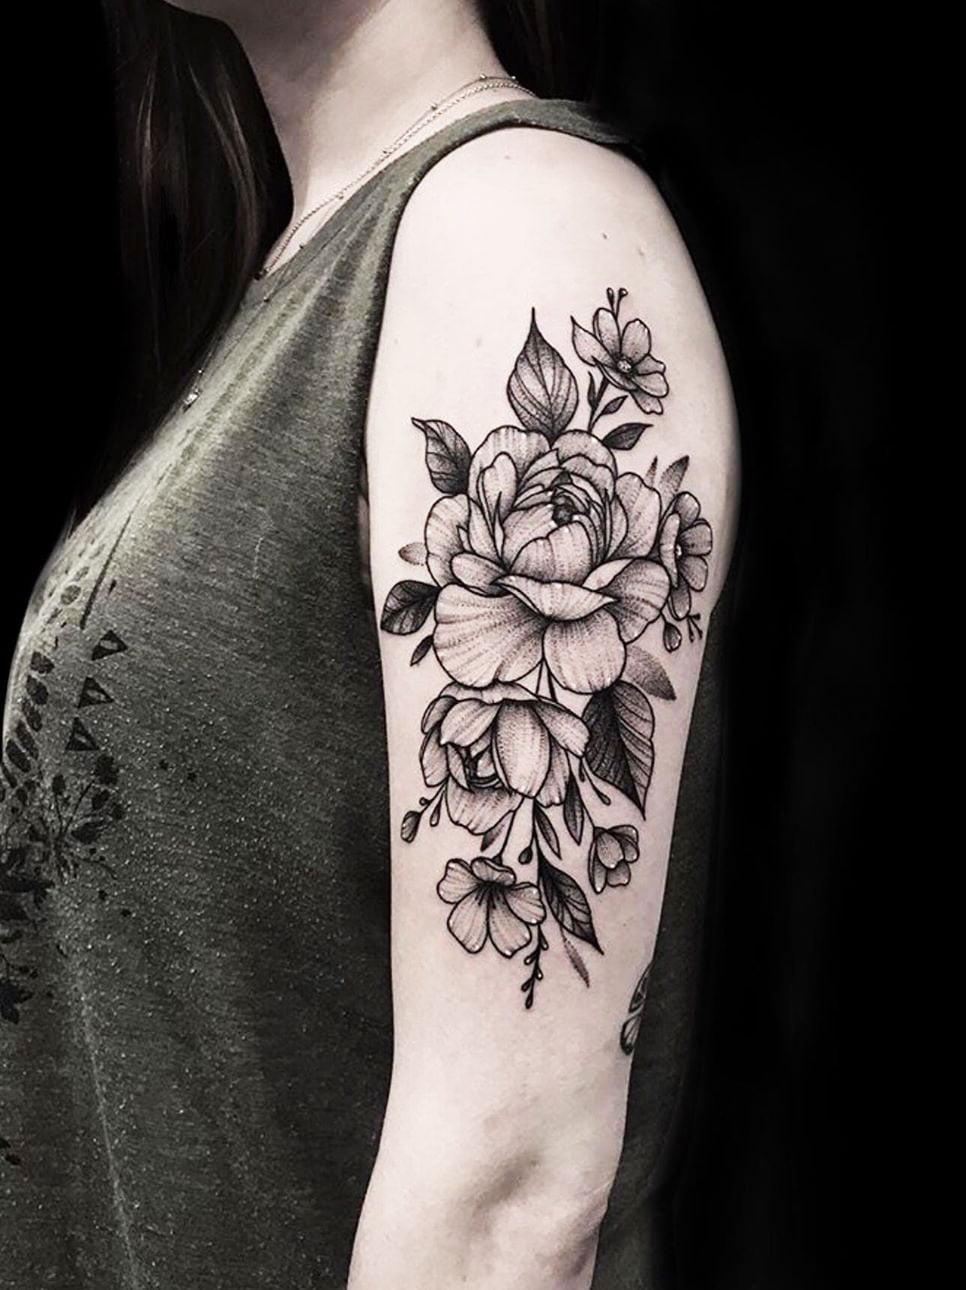 Painful Love Tattoo